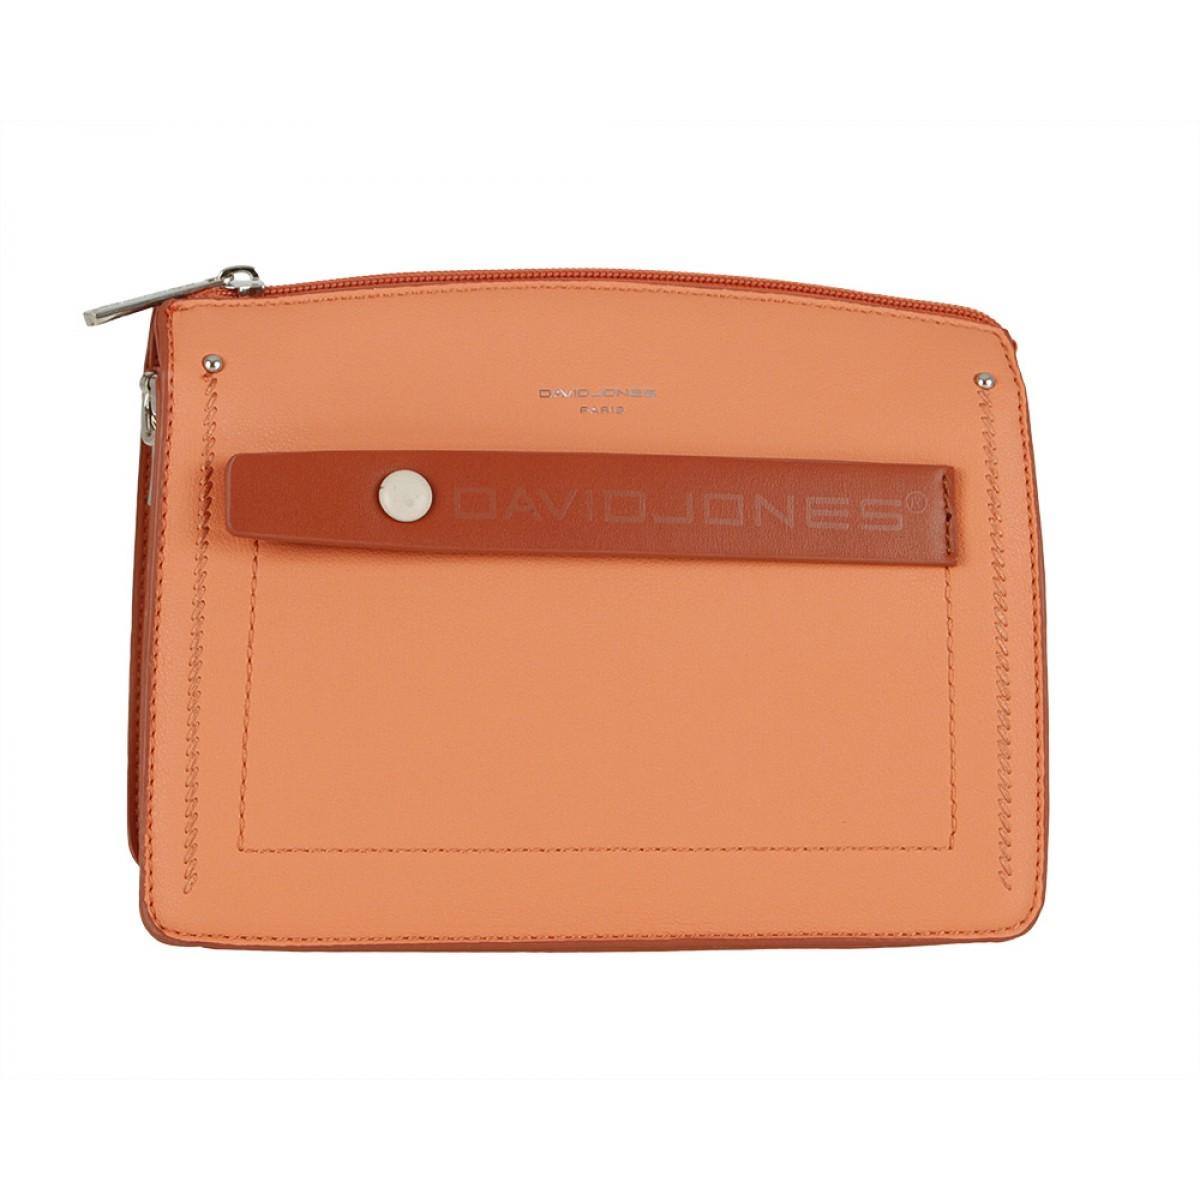 Жіноча сумка David Jones 6247-1 CORAL